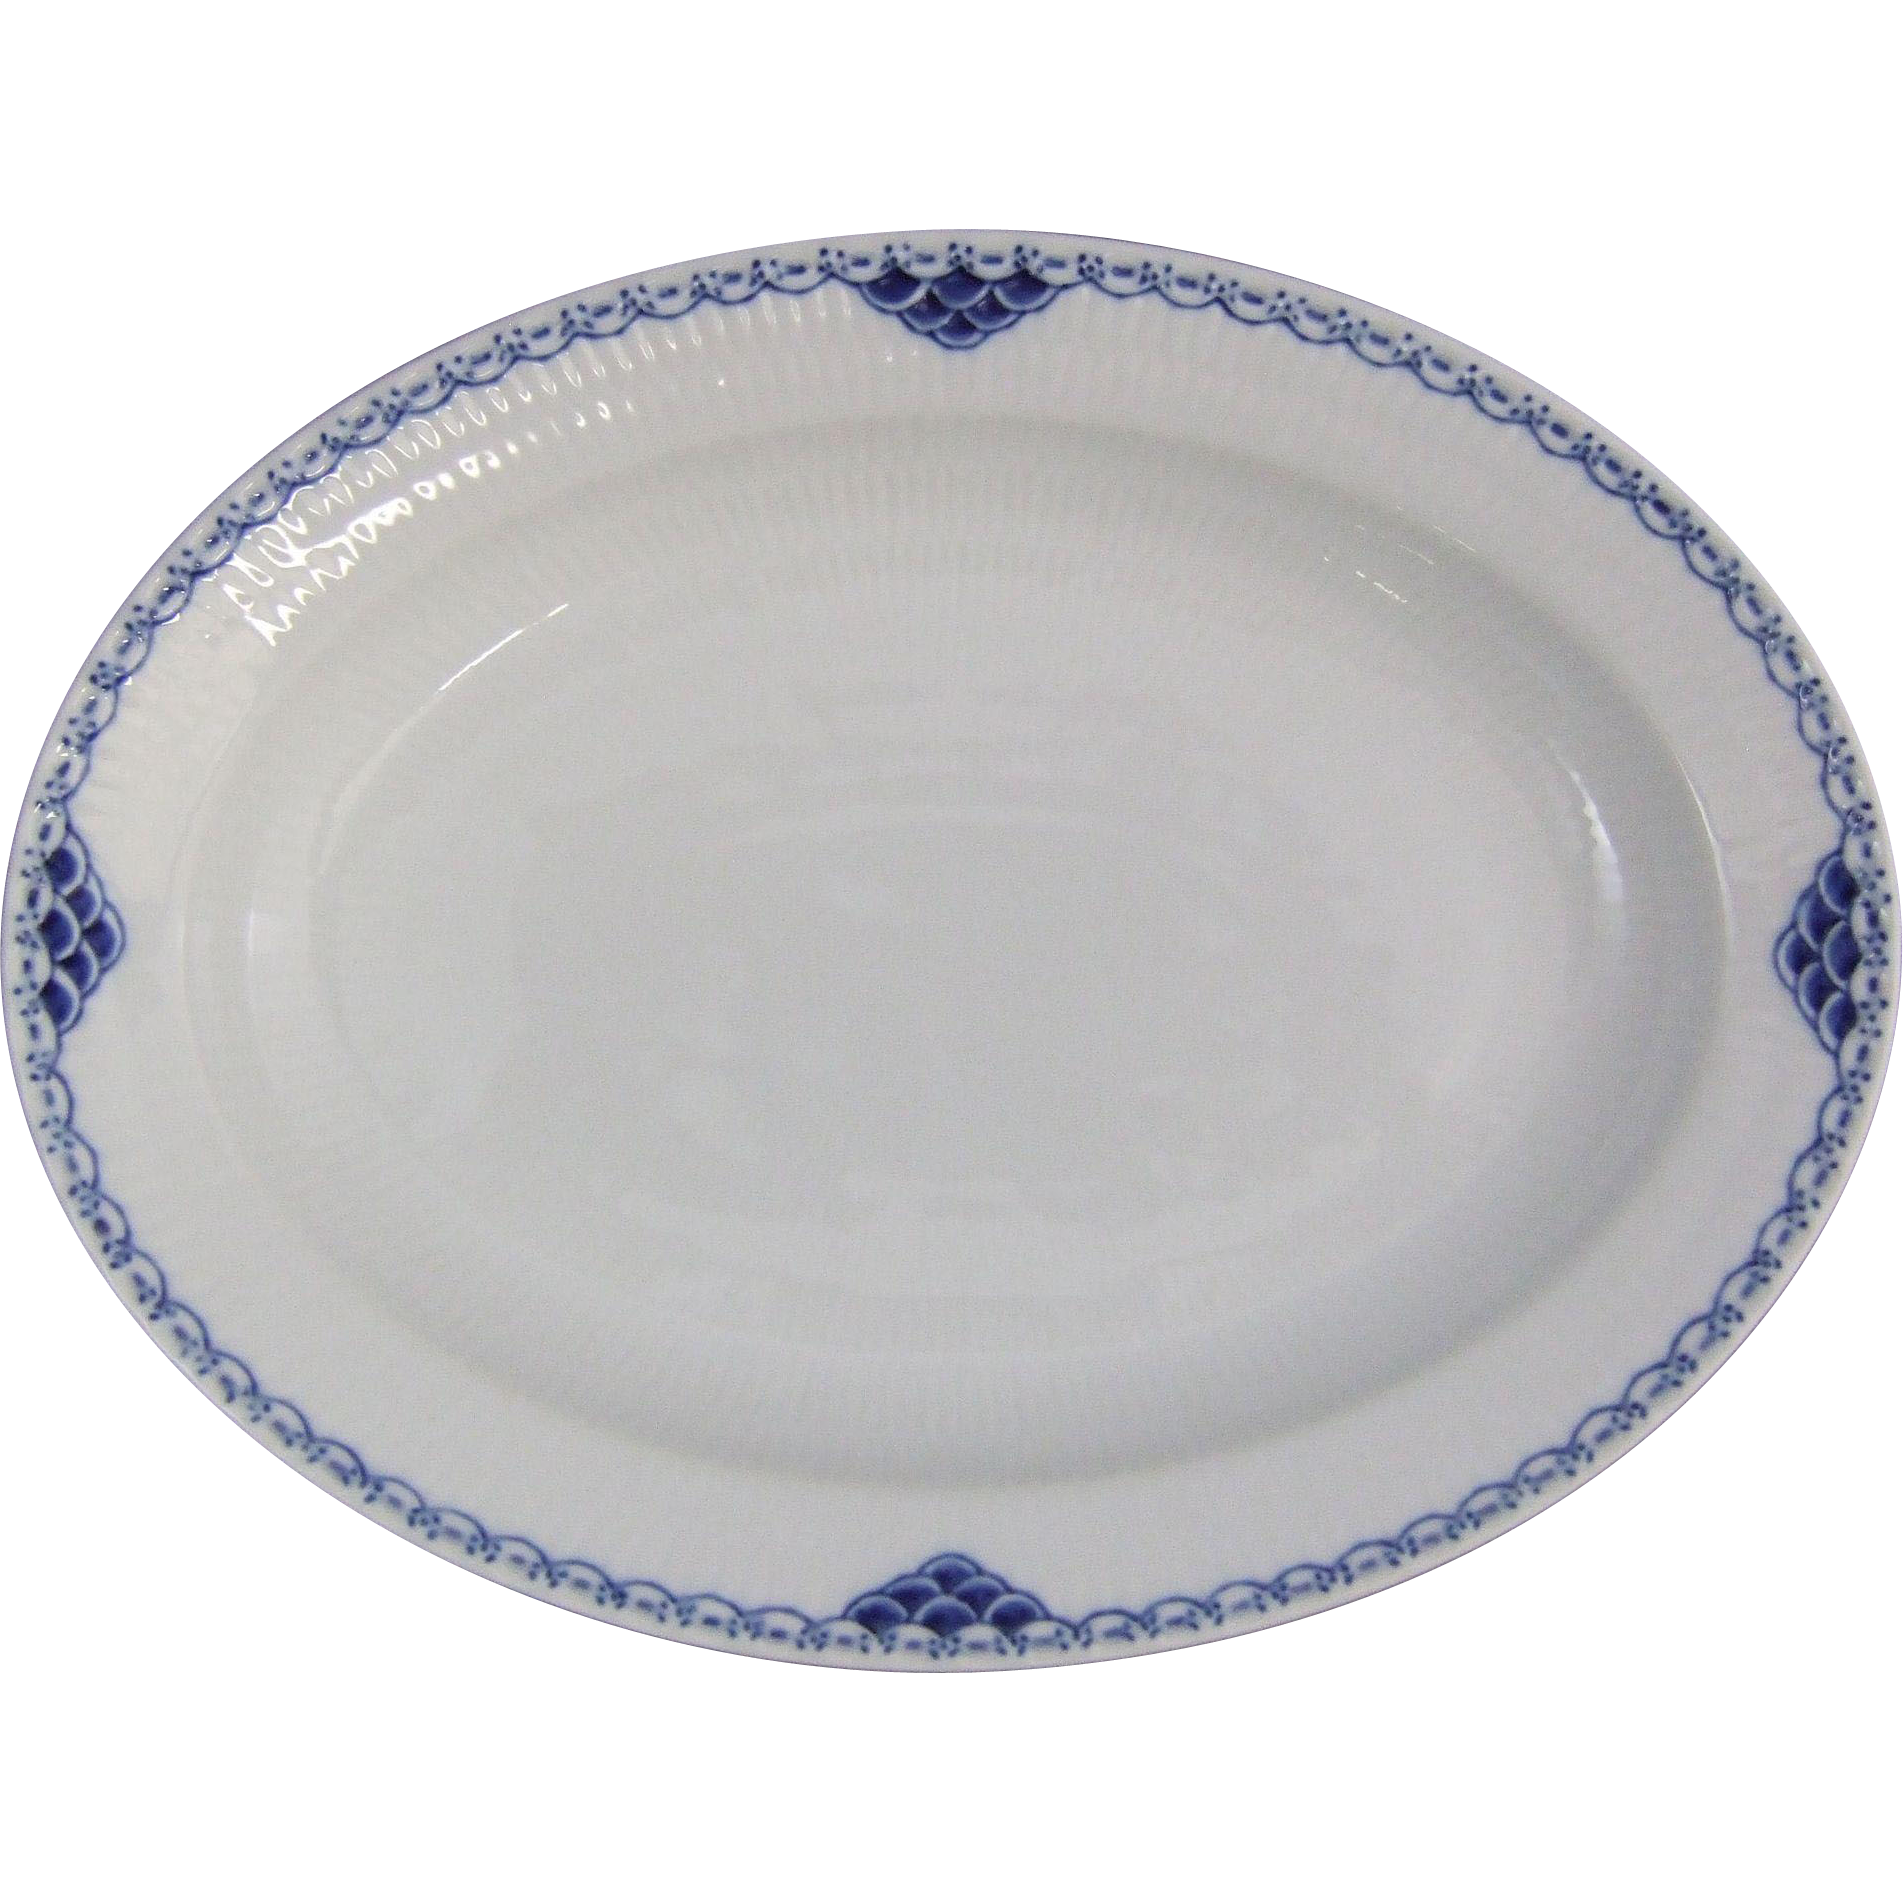 Royal Copenhagen Denmark Princess Service Oval Porcelain Serving Platter